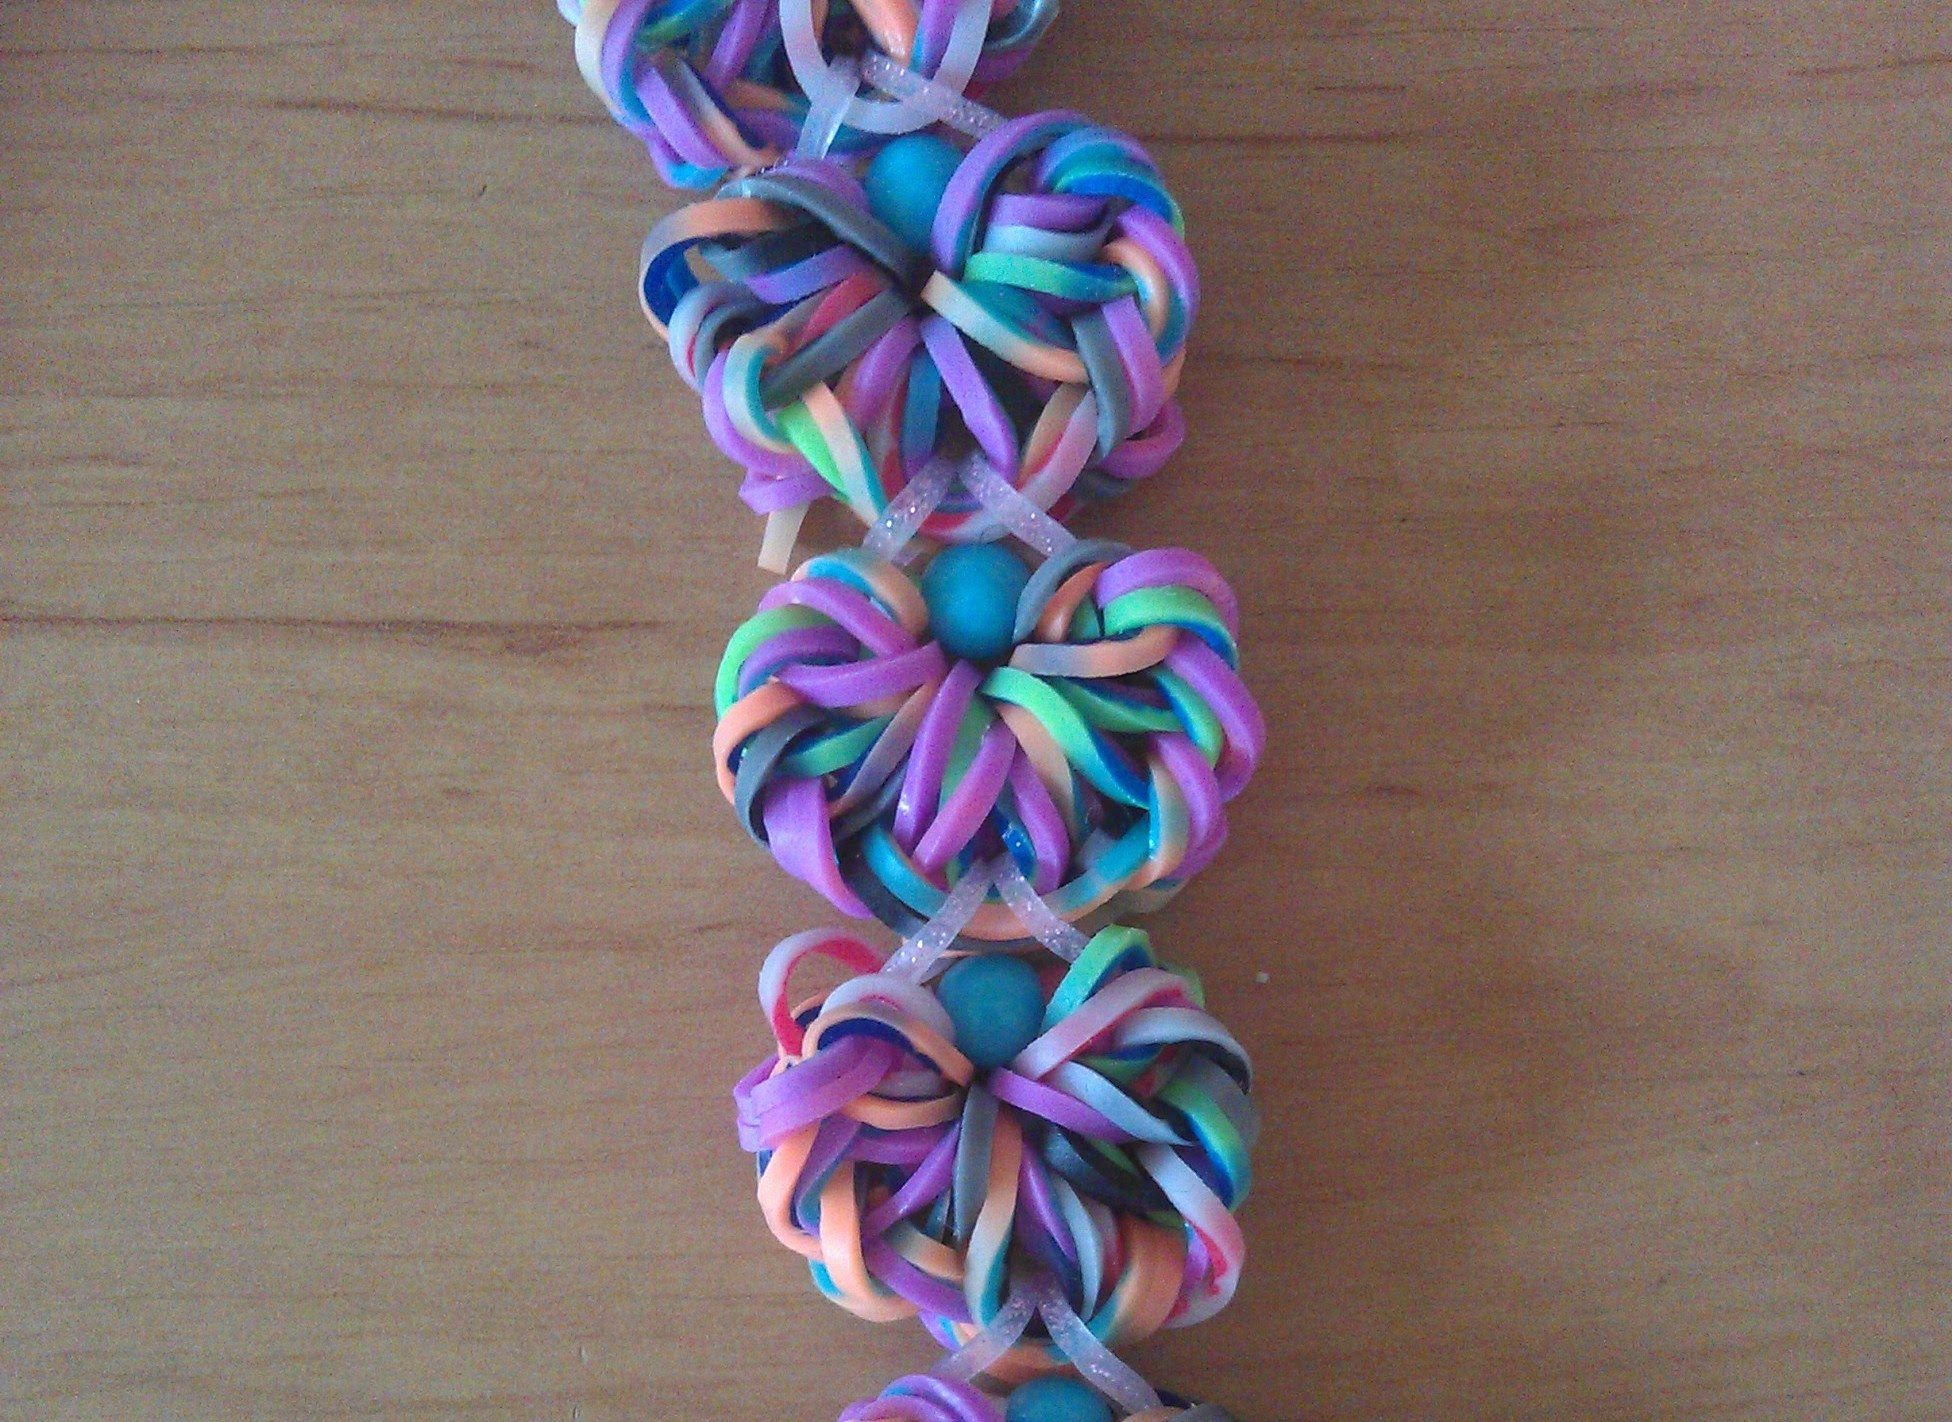 Rainbow loom Nederlands: flower doily armband. bracelet double bands. designed by waveloomers (IG)